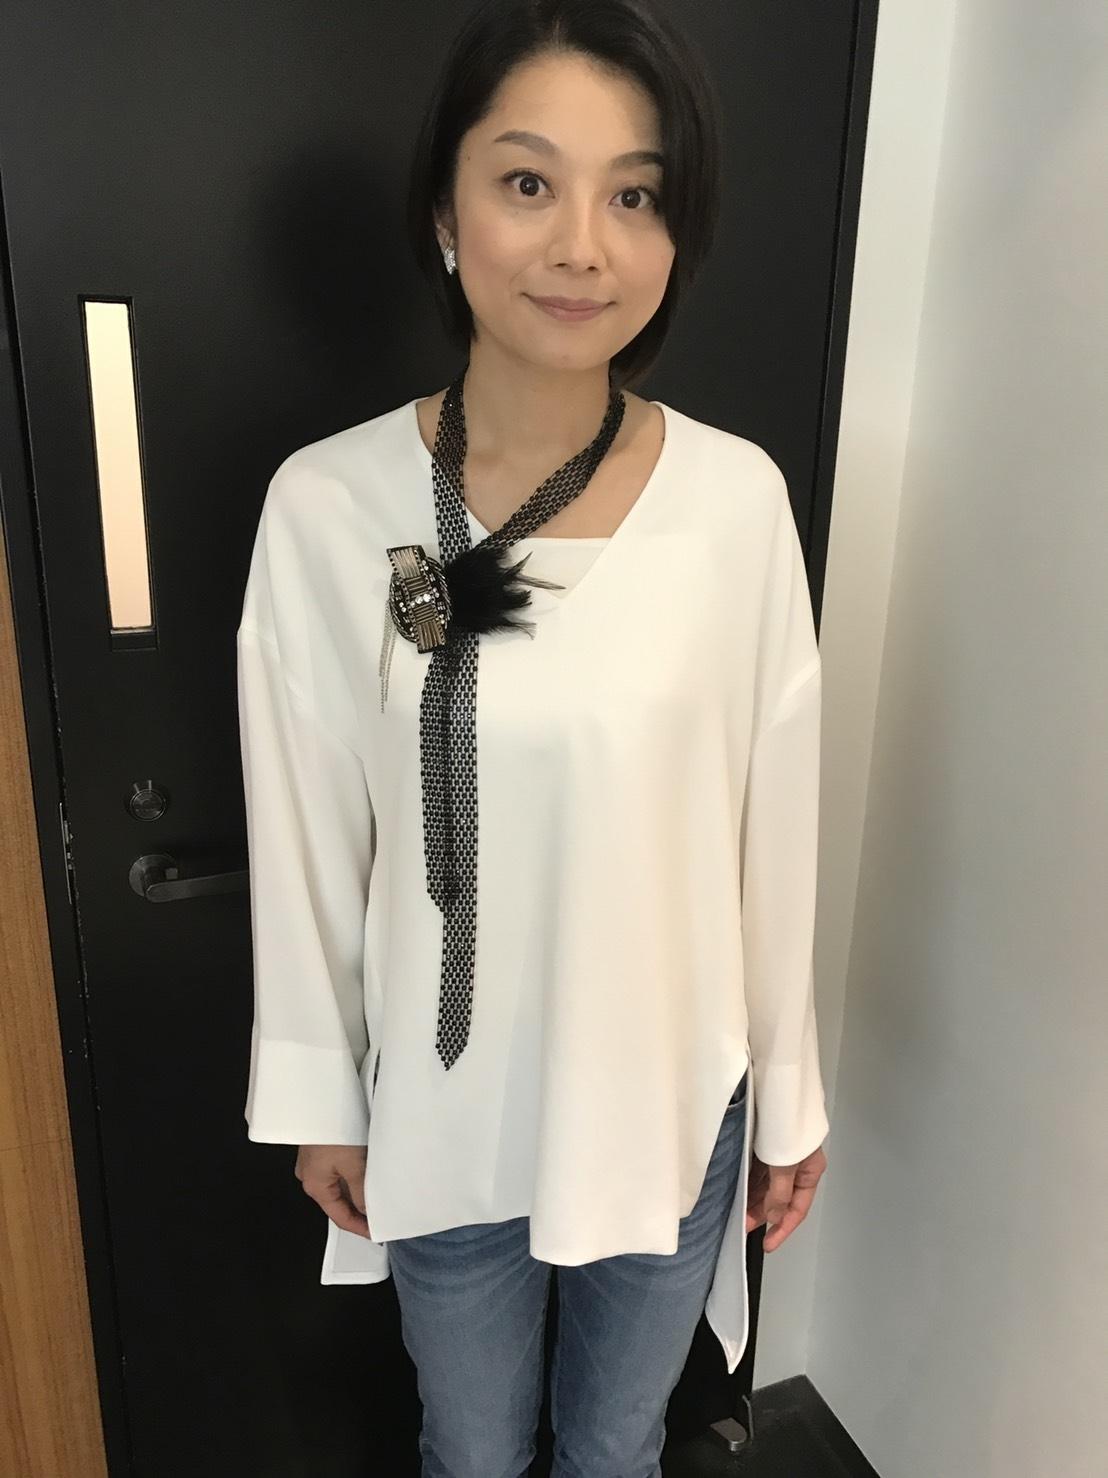 栄子姫と一緒♪_d0339889_14452385.jpg